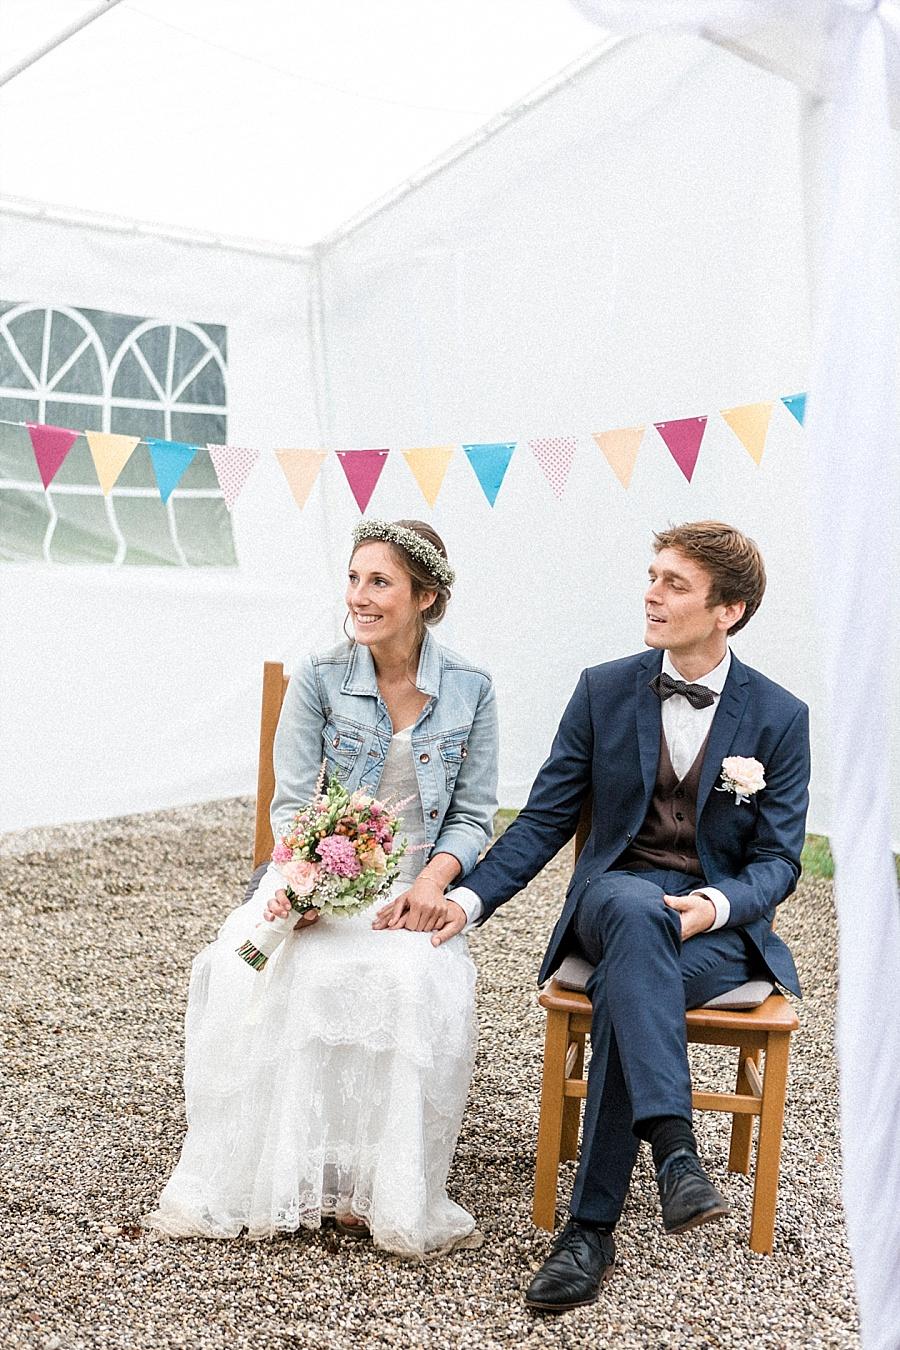 Jeansjacke zum Brautkleid